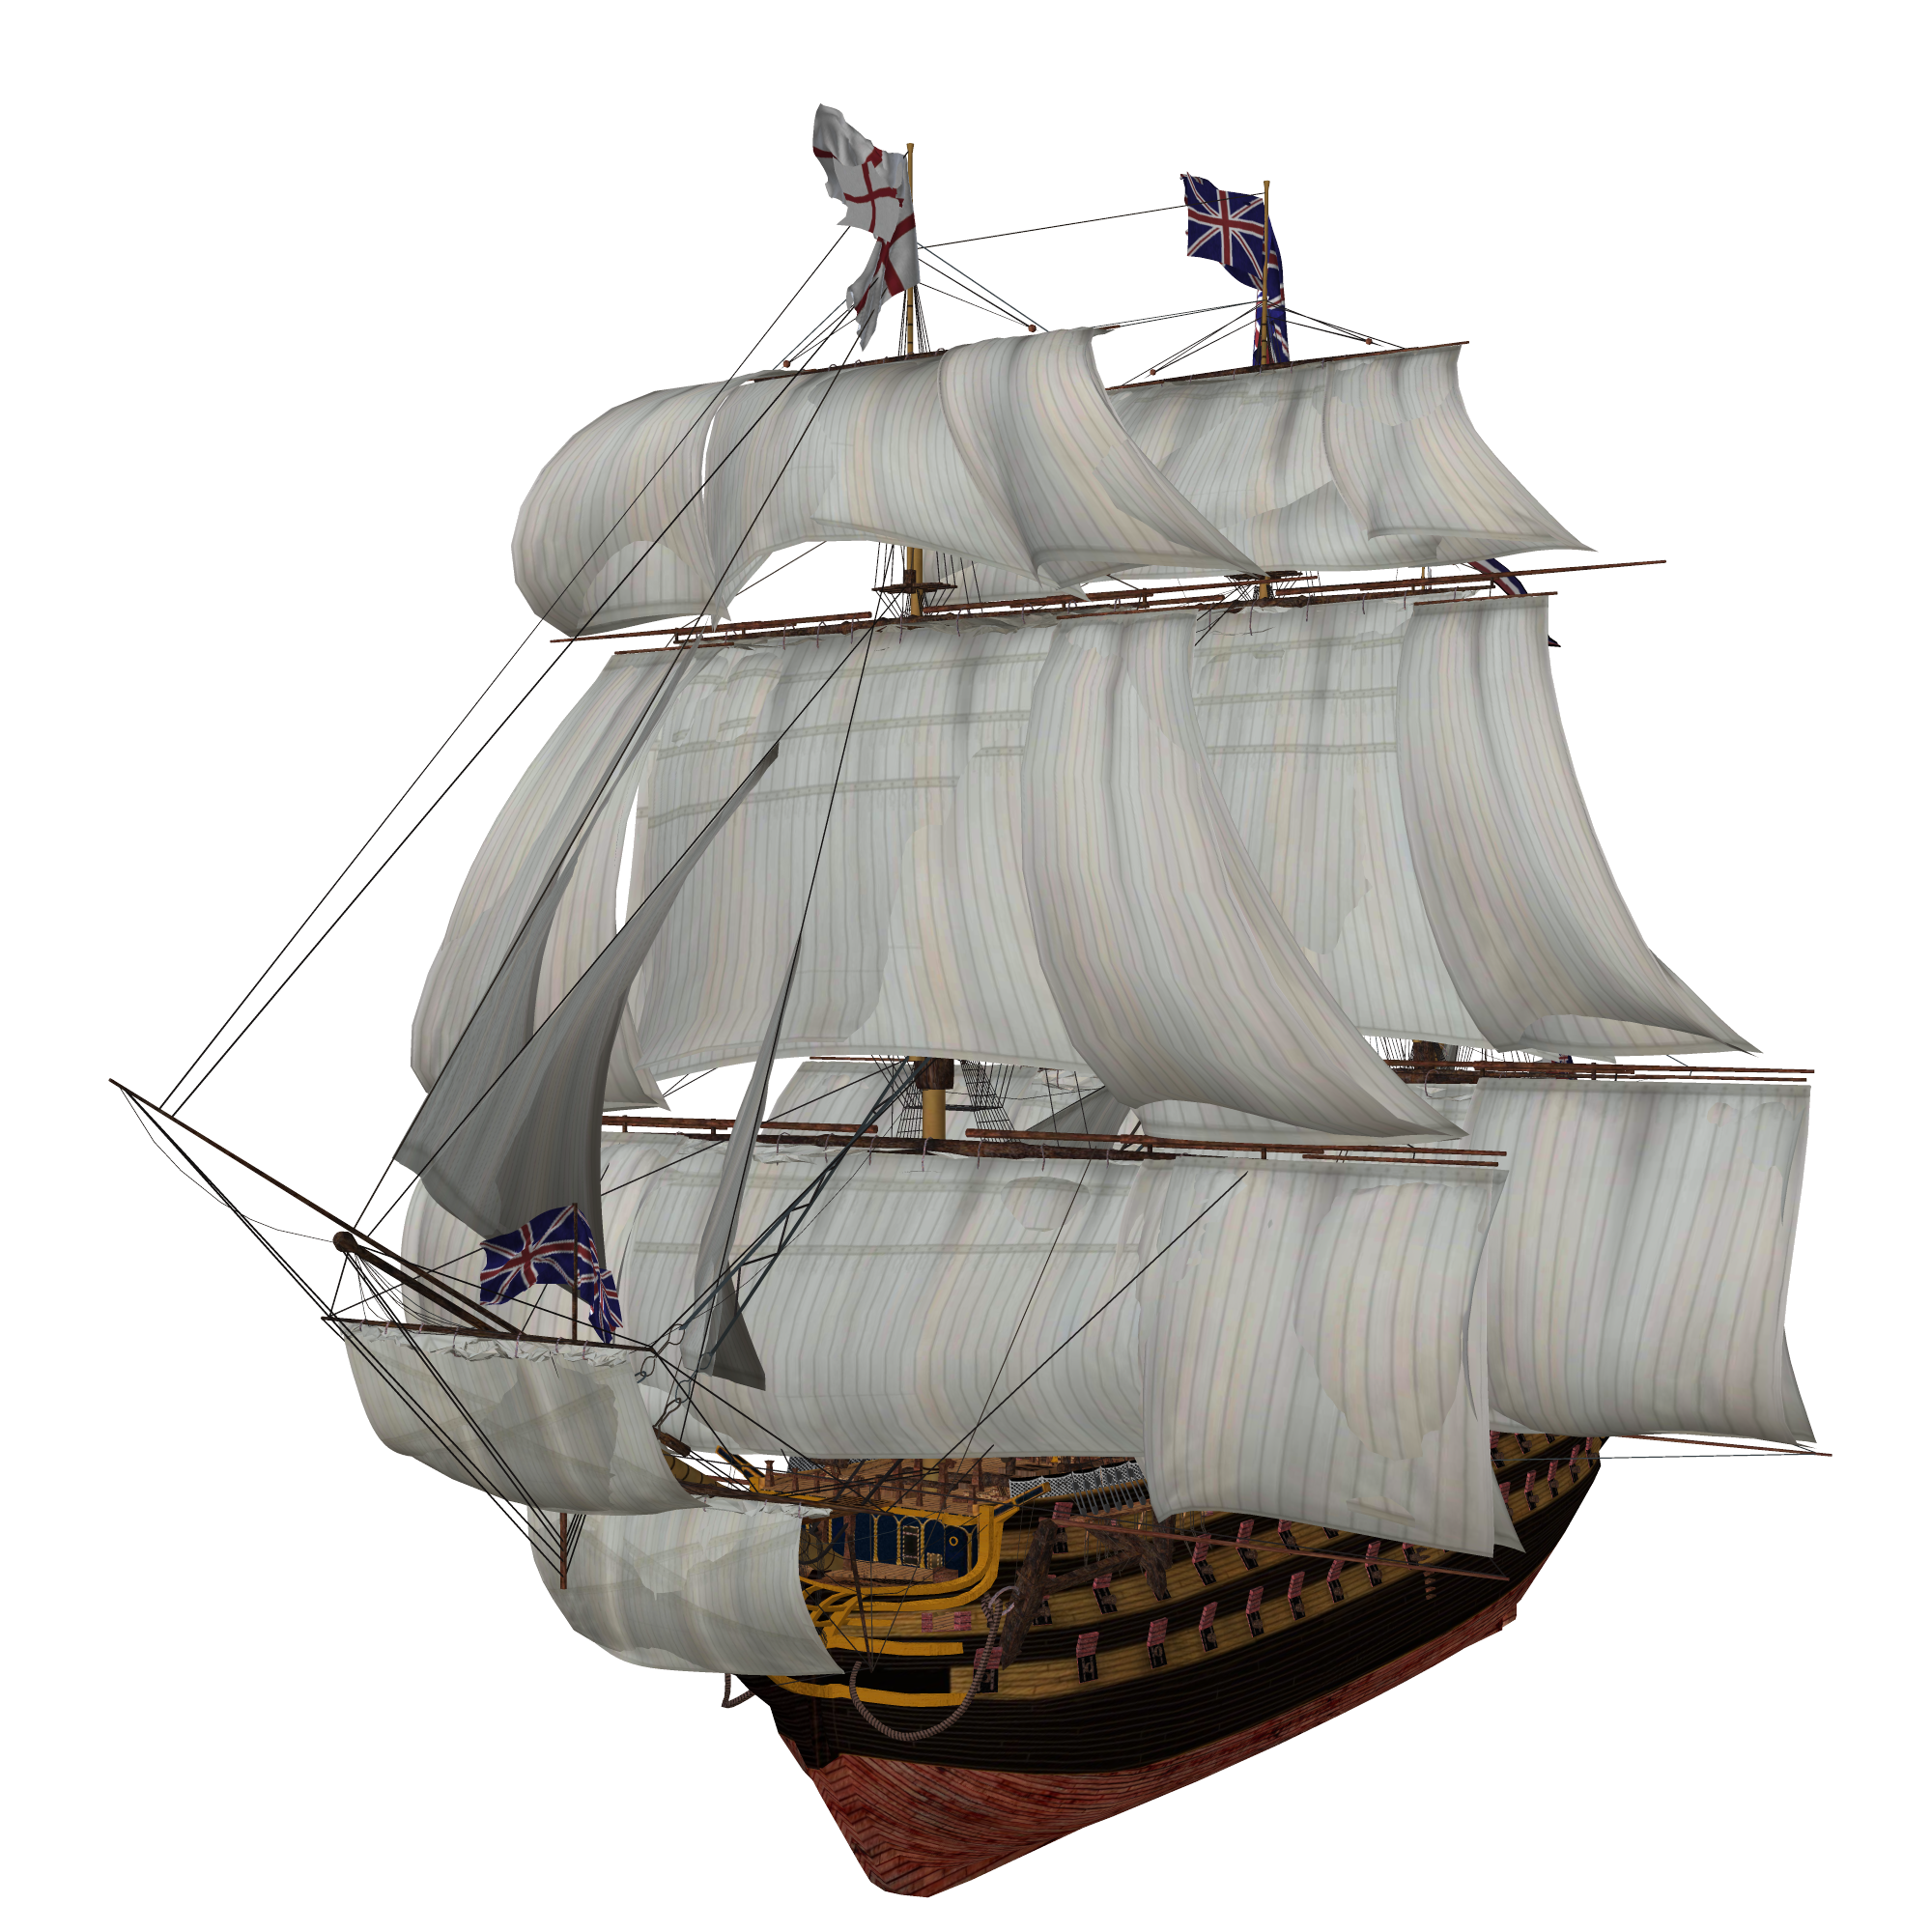 Download Png Image Sailing Ship Png Image Sailing Ships Pirate Ship Model Pirate Ship